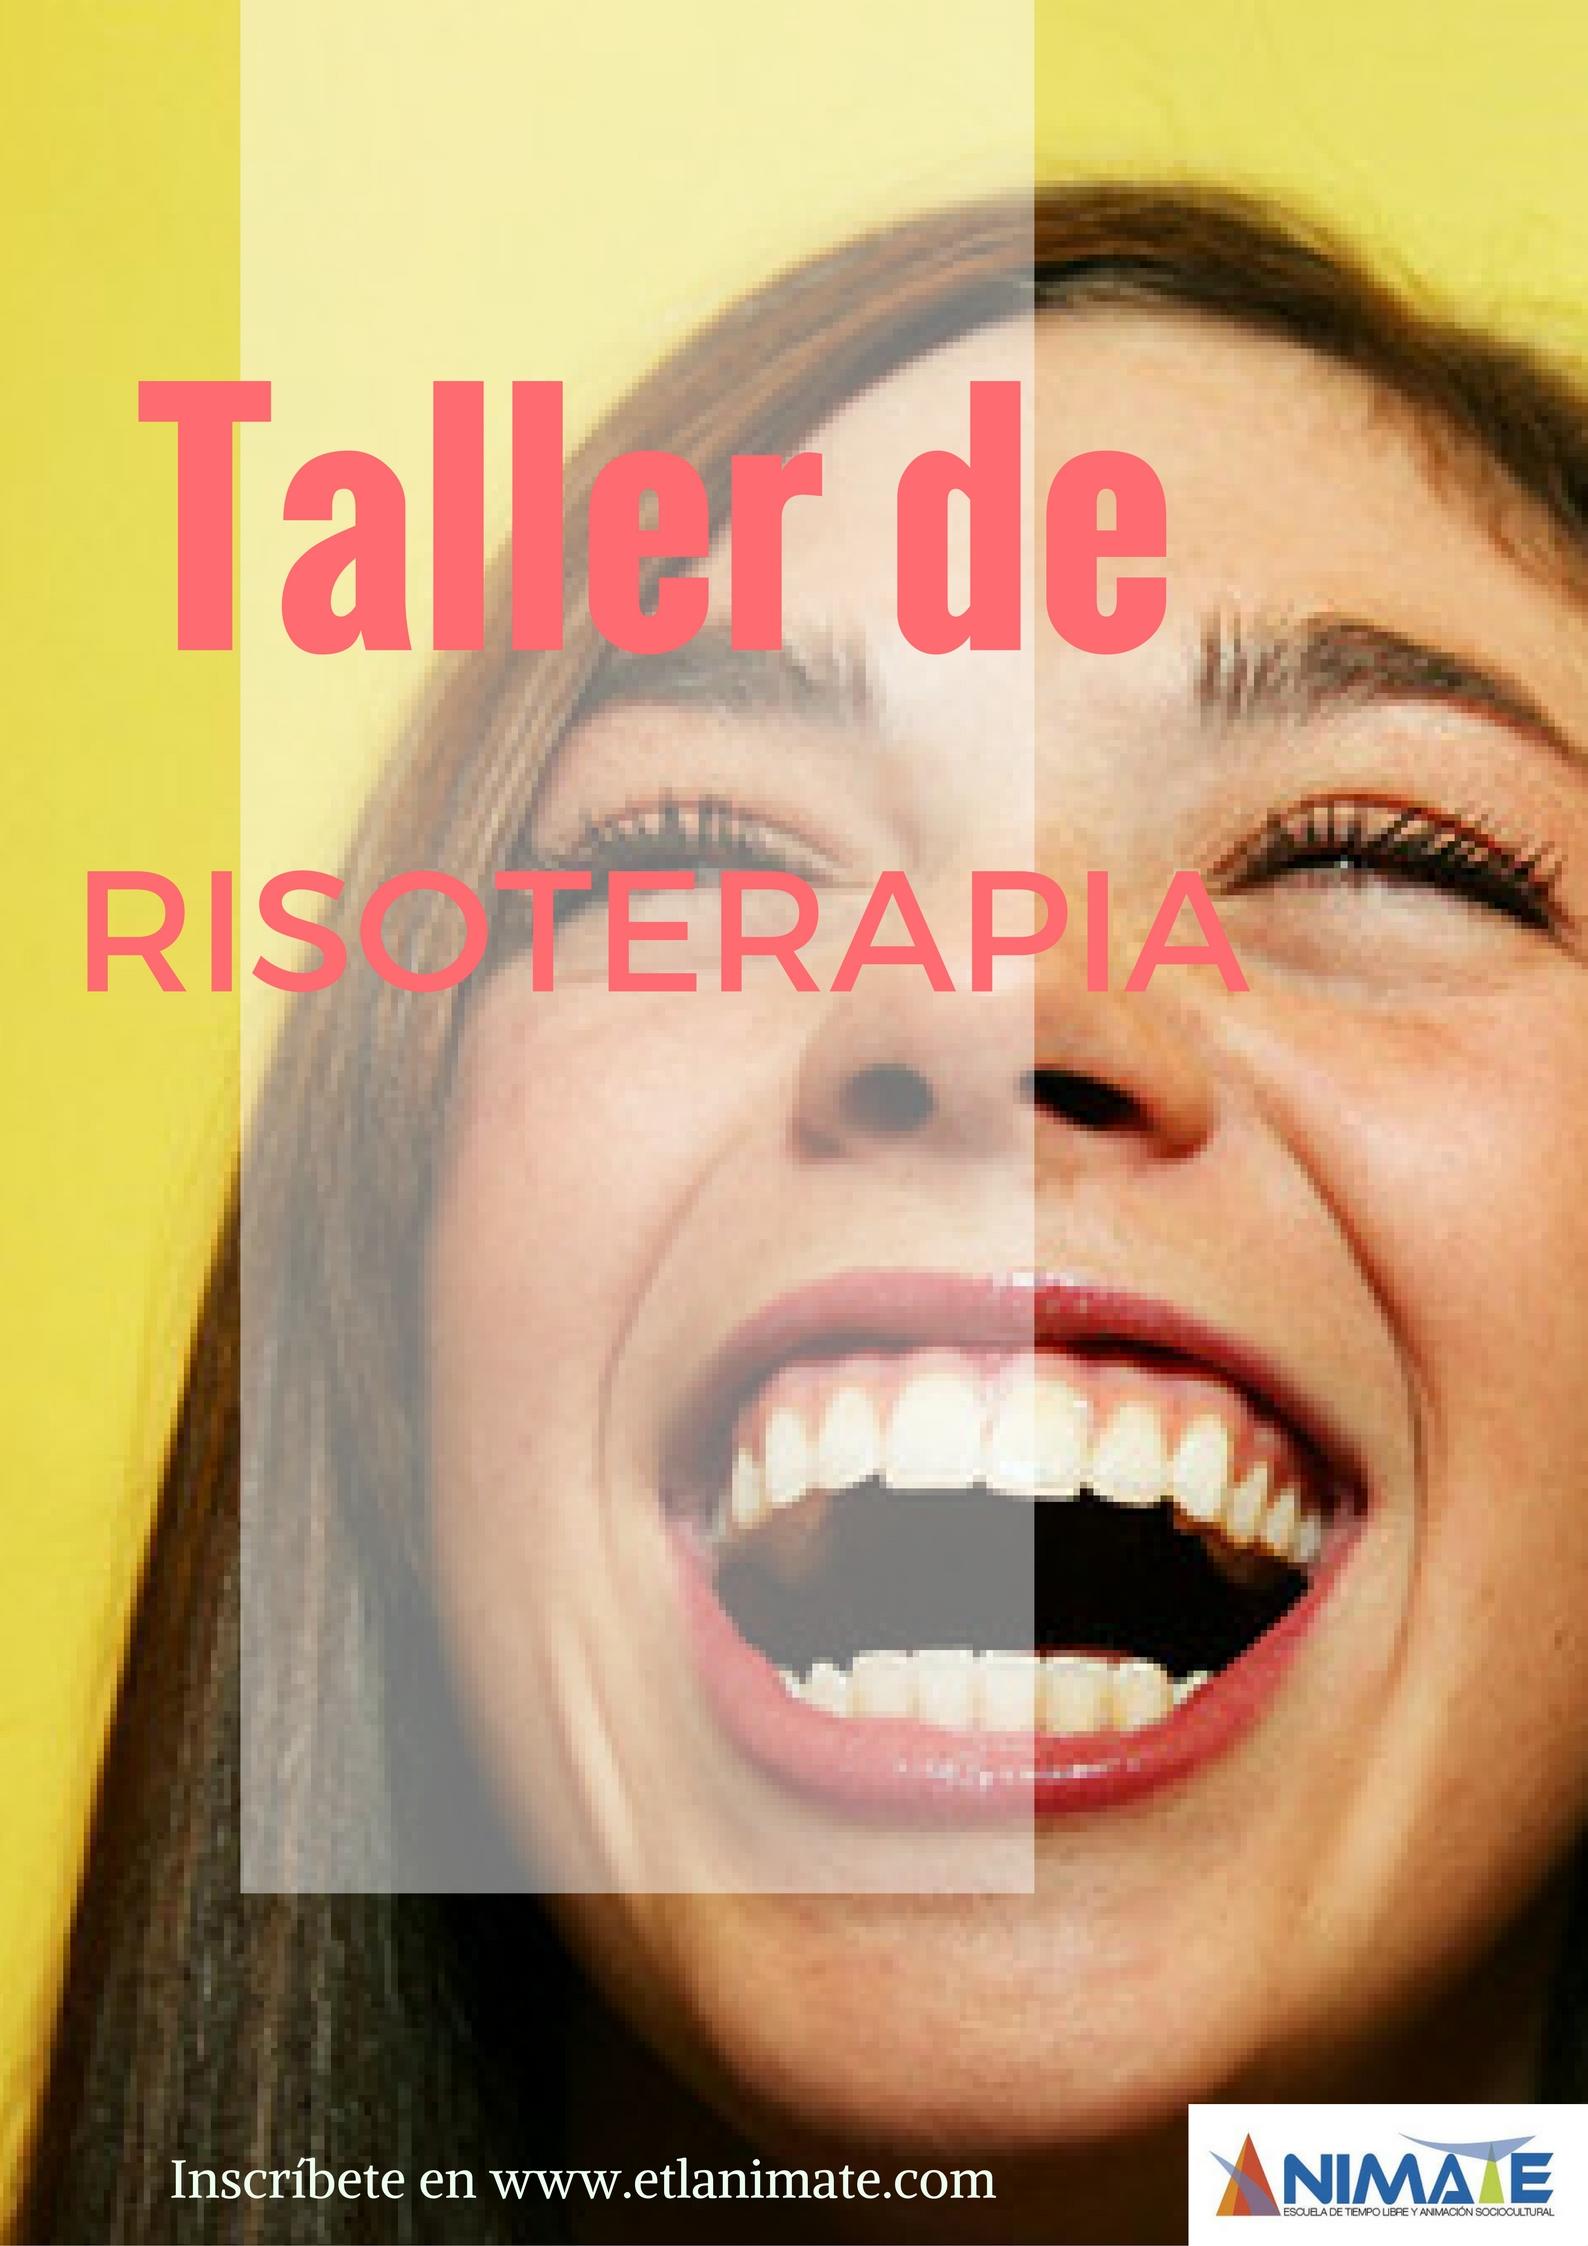 taller-de-risoterapia